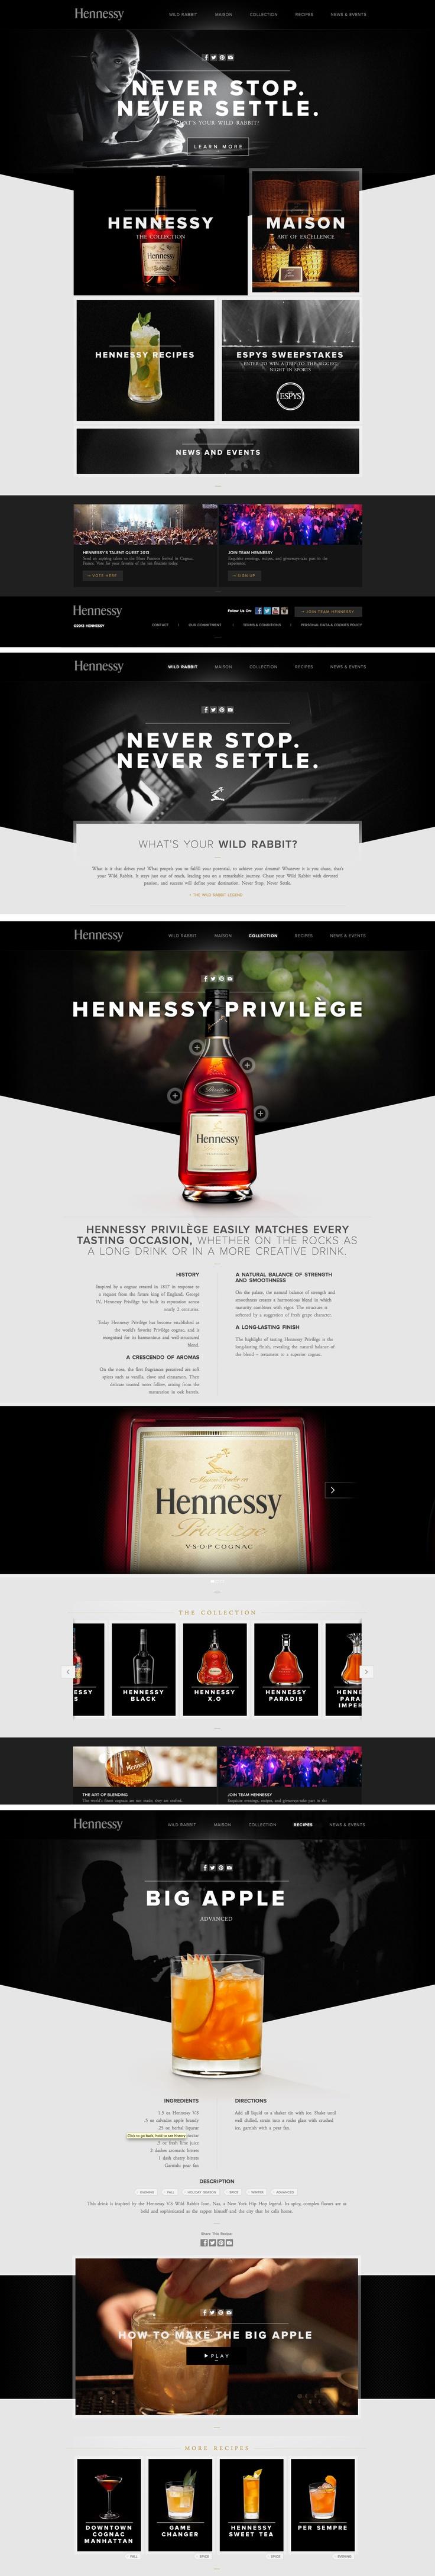 hennessy, drink, black